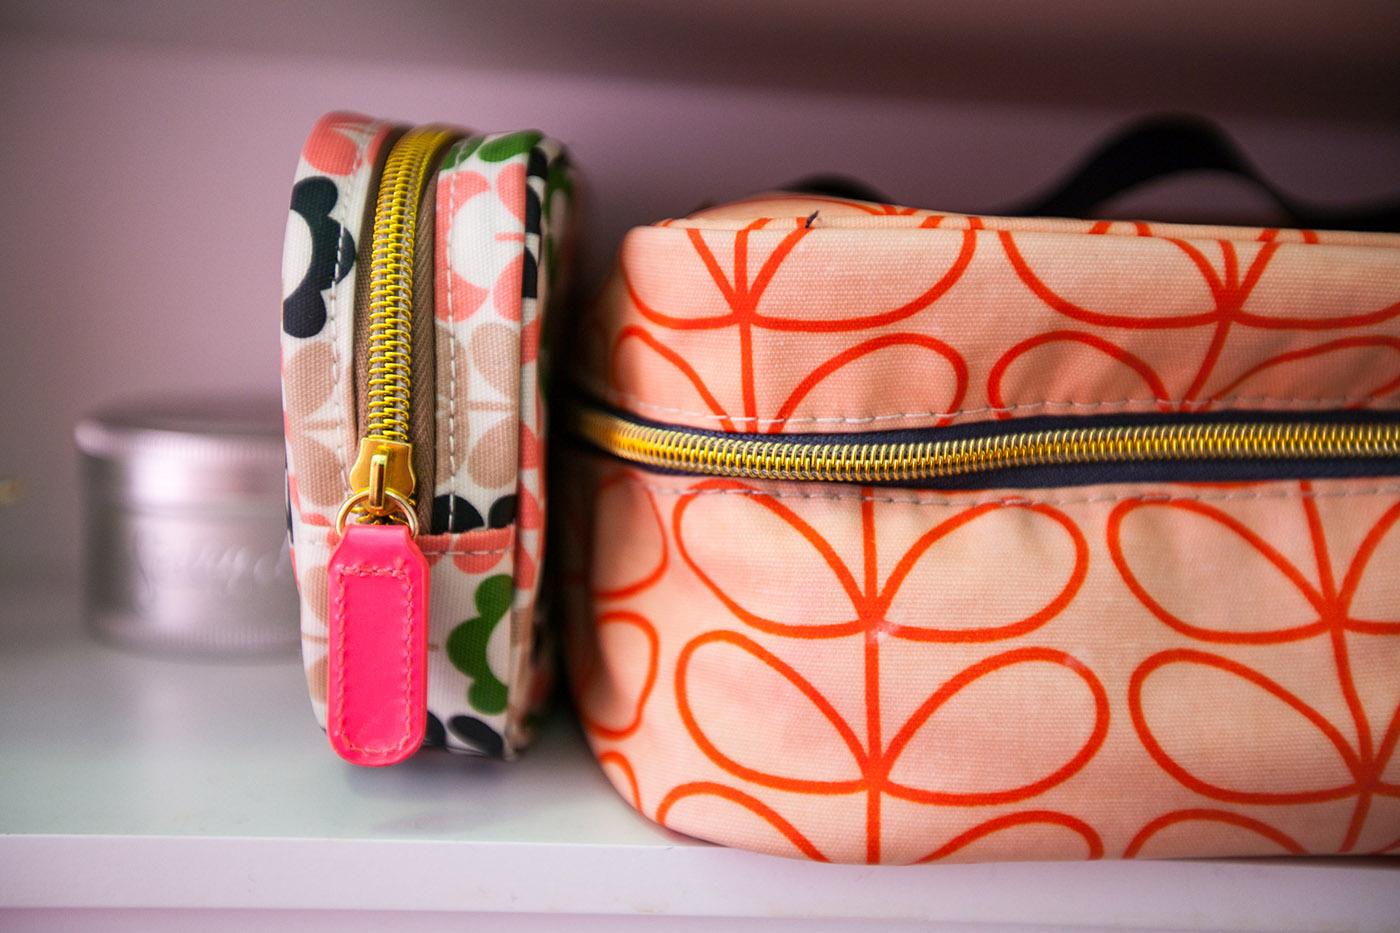 Pink Orla Kiely cosmetic bags - Pretty in Pink Bathroom